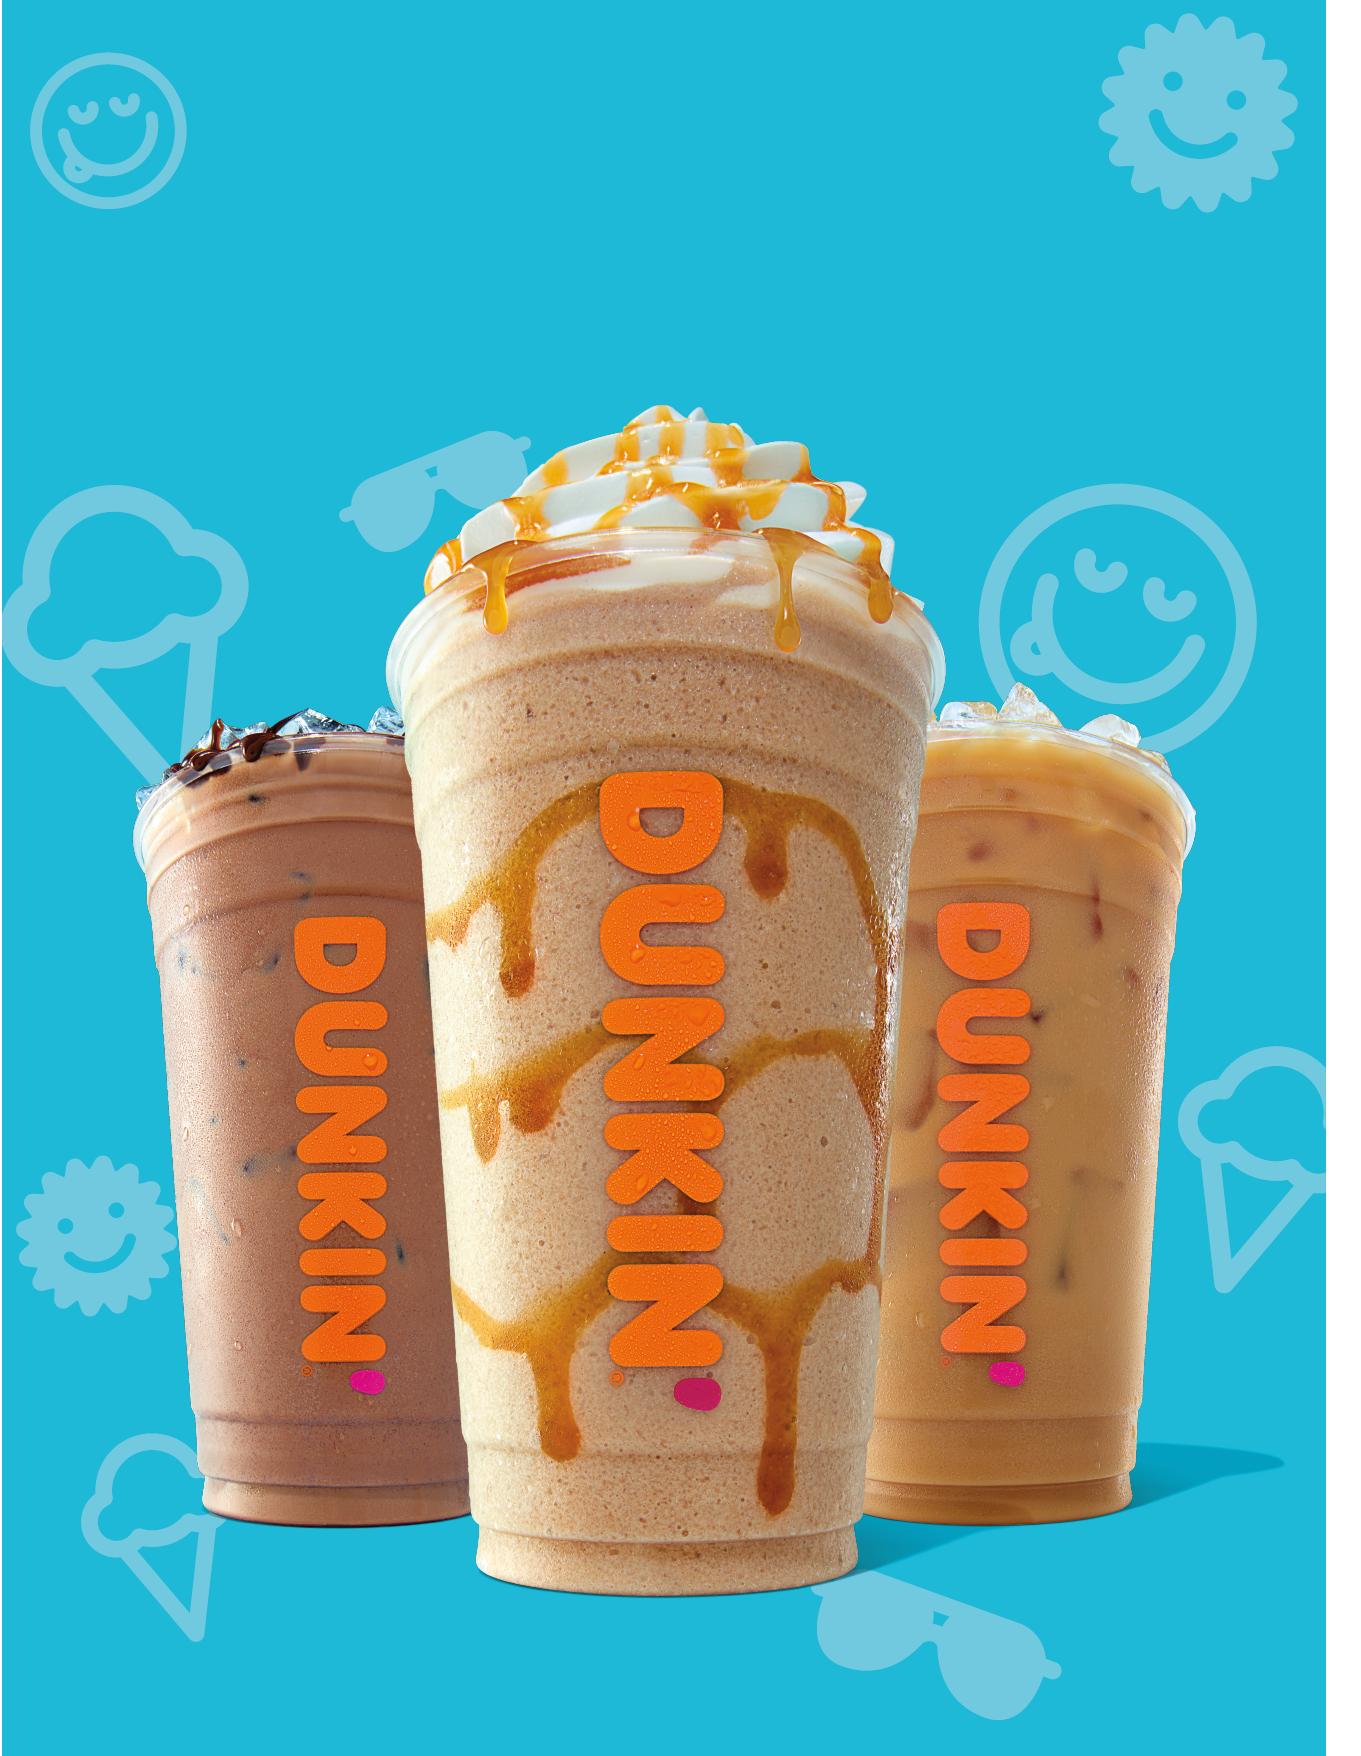 Dunkin Donuts Coffee Flavors Summer 2019 in 2020 Dunkin